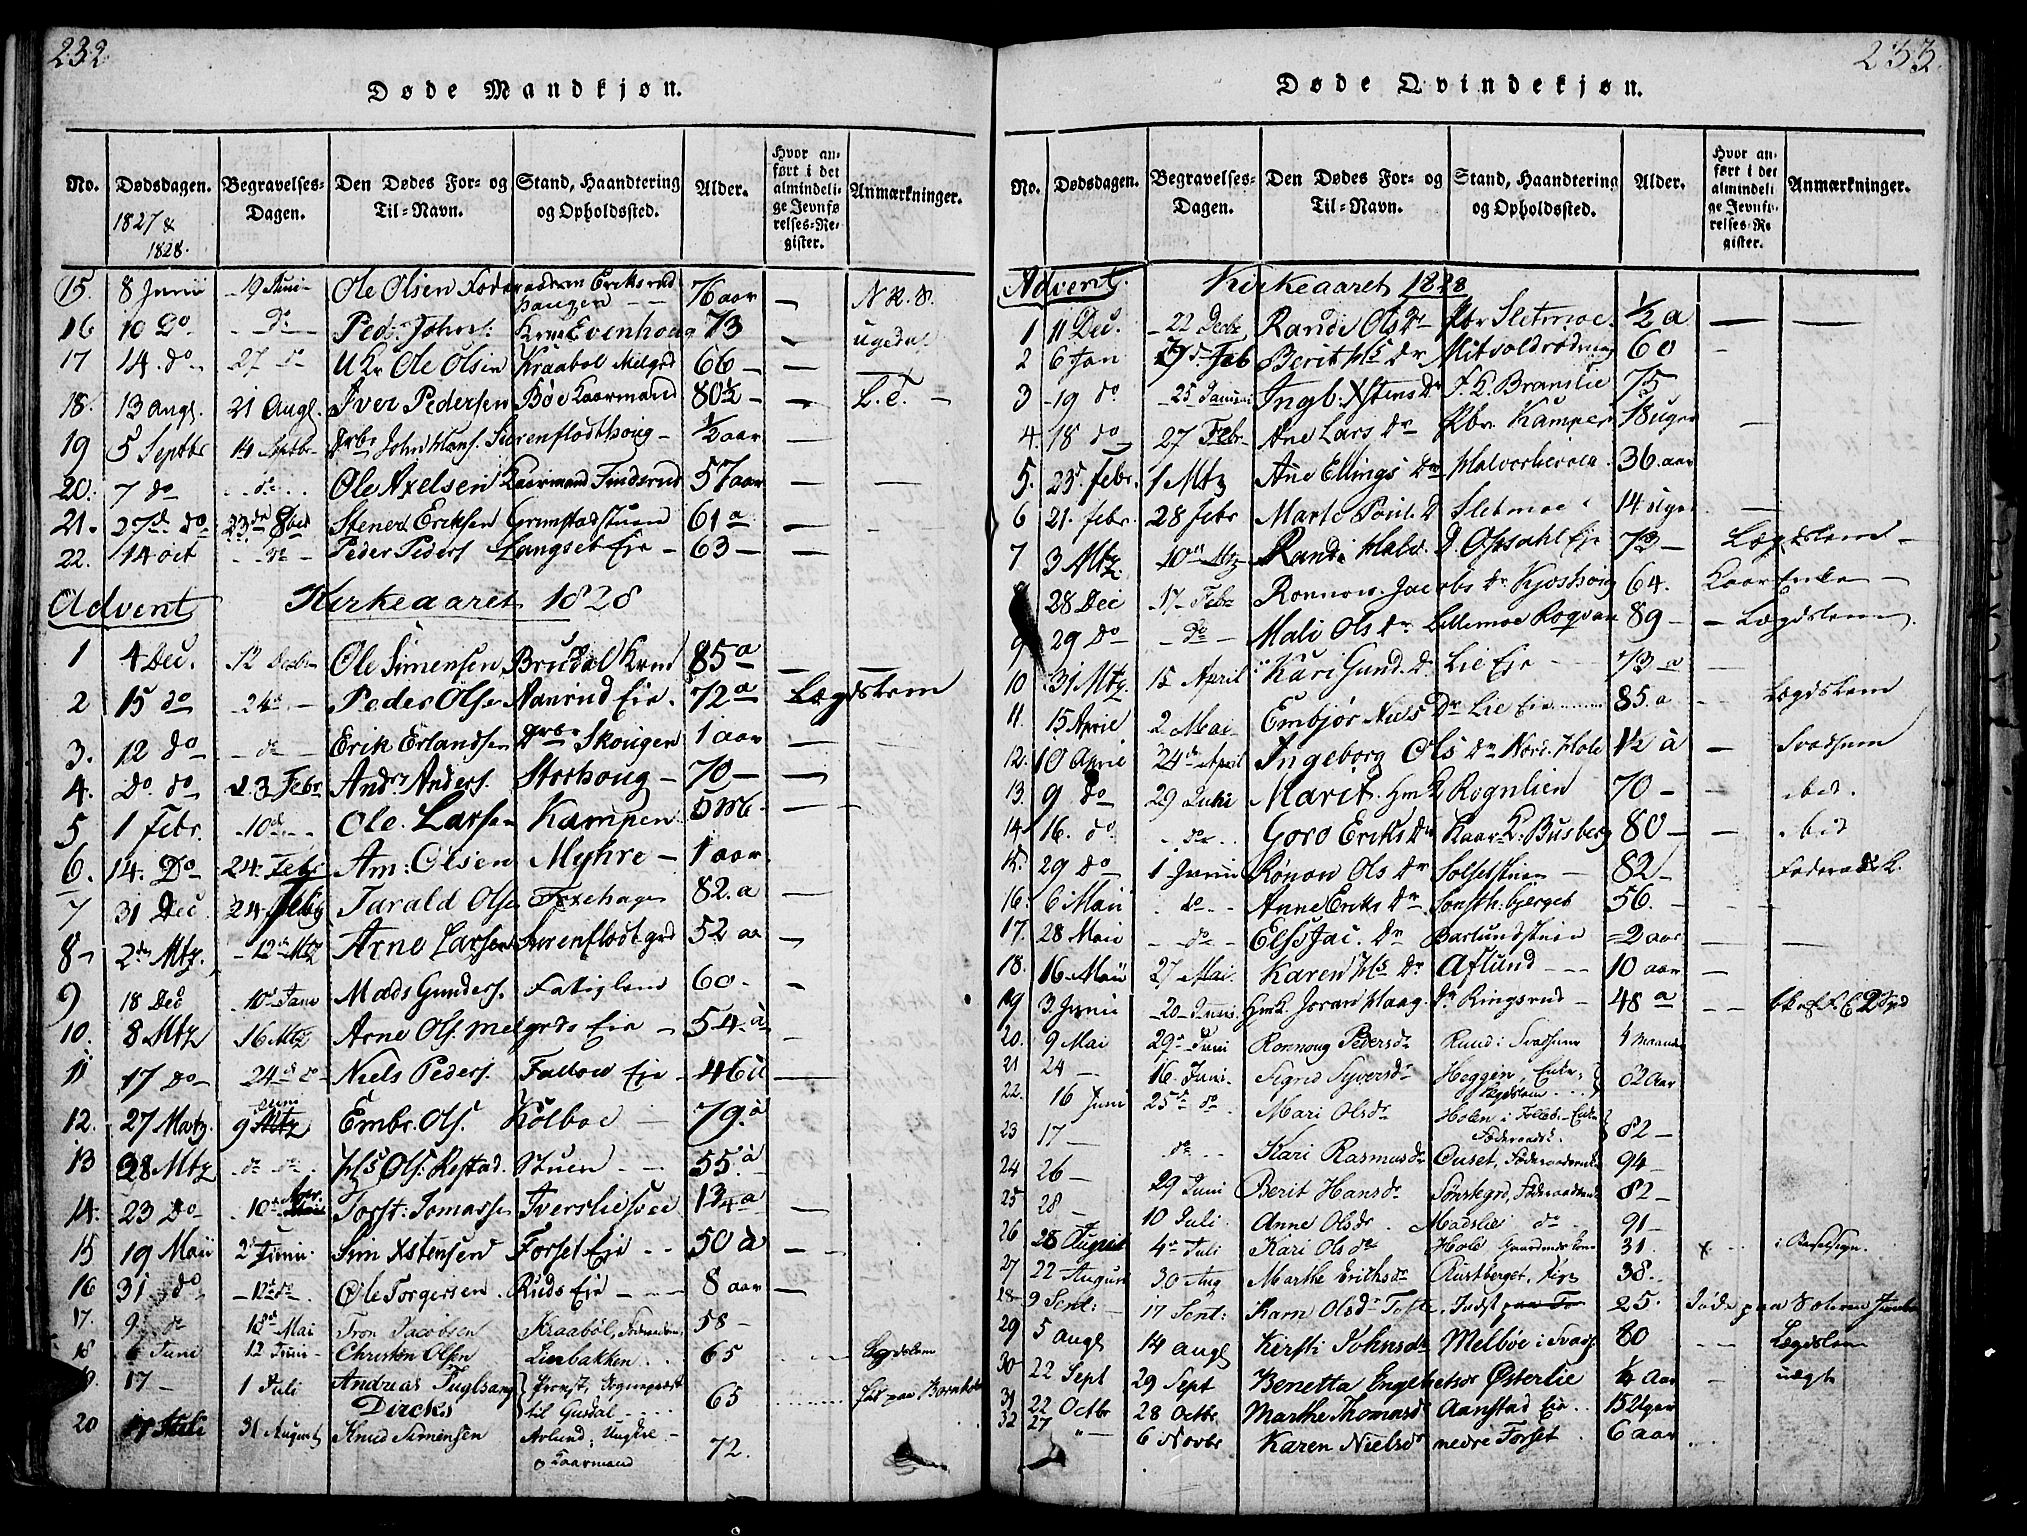 SAH, Gausdal prestekontor, Ministerialbok nr. 5, 1817-1829, s. 232-233